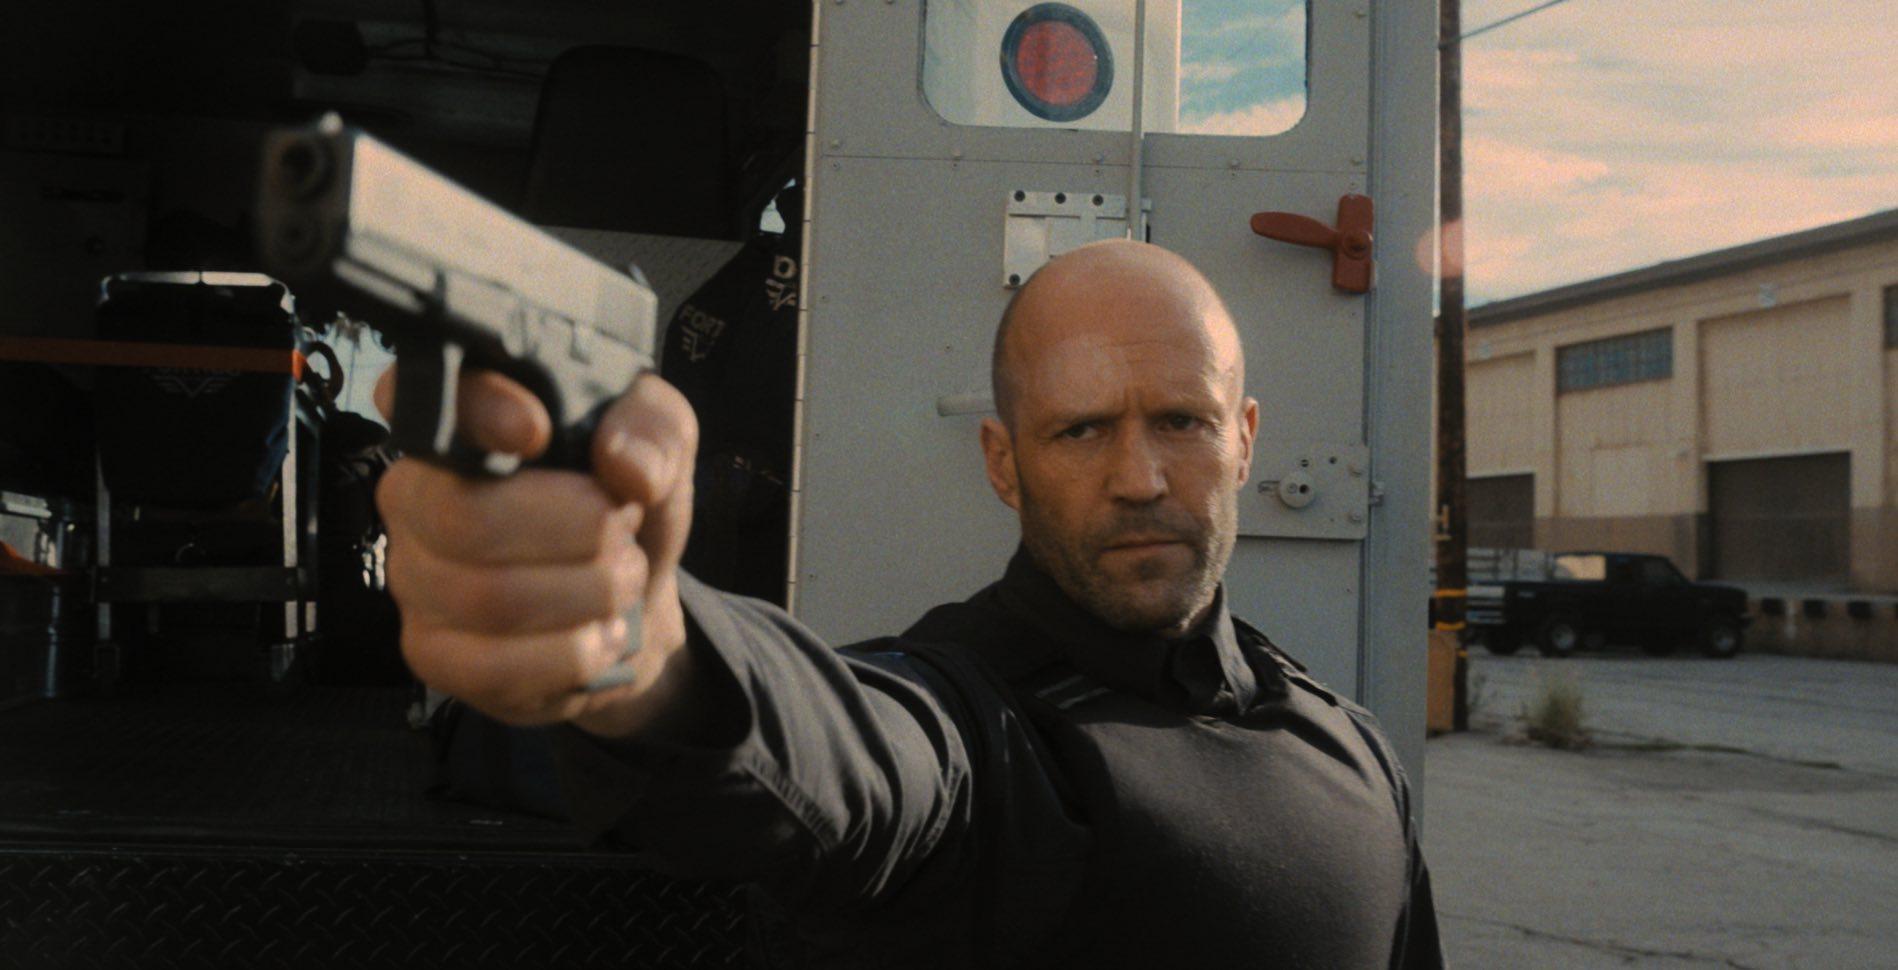 Jason Statham Wrath of Man movie review